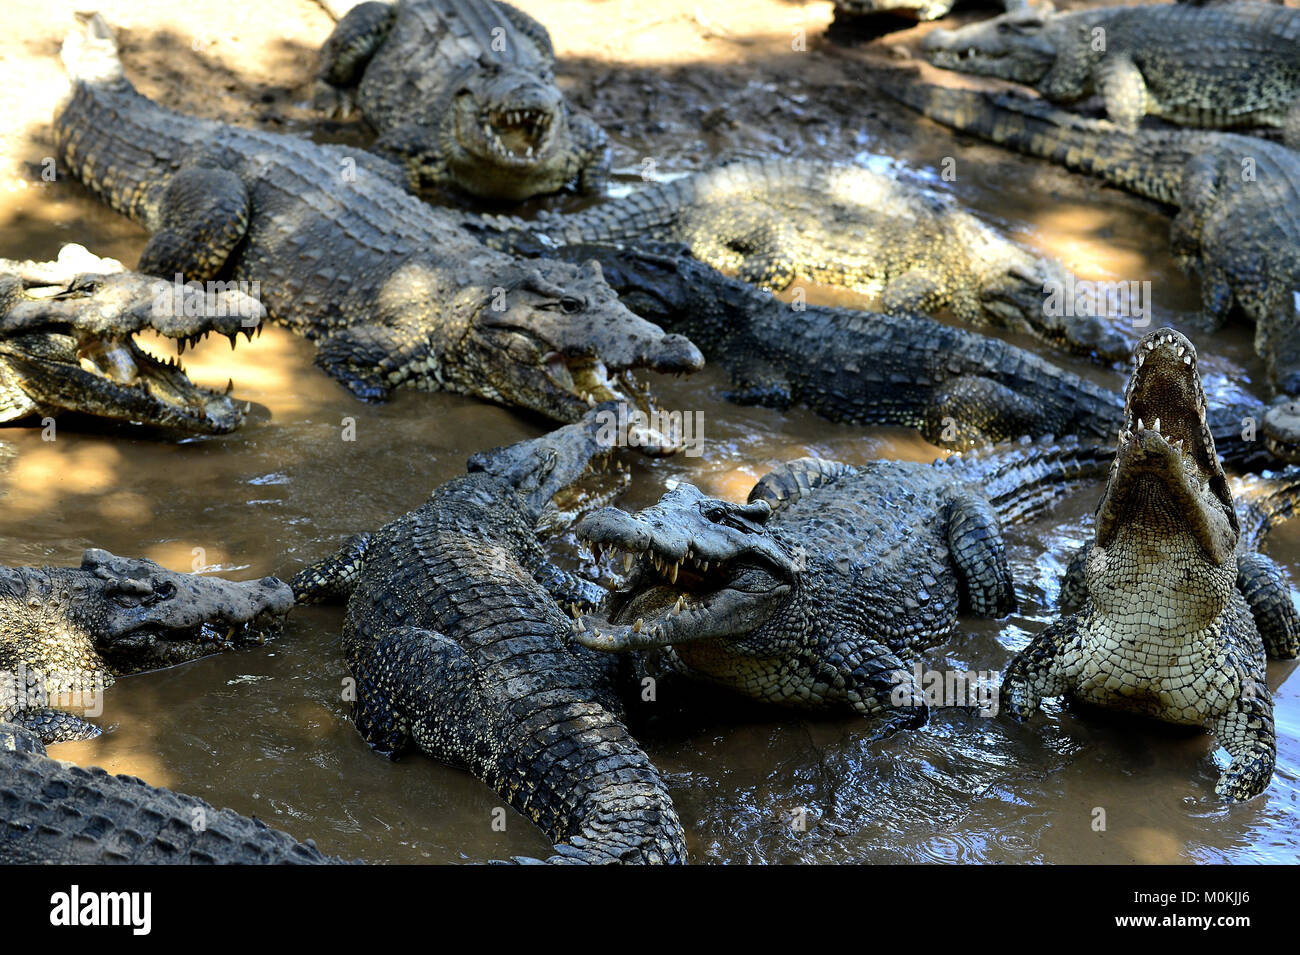 Group of Cuban Crocodiles (crocodylus rhombifer). Image taken in a natural park in the island of Cuba - Stock Image